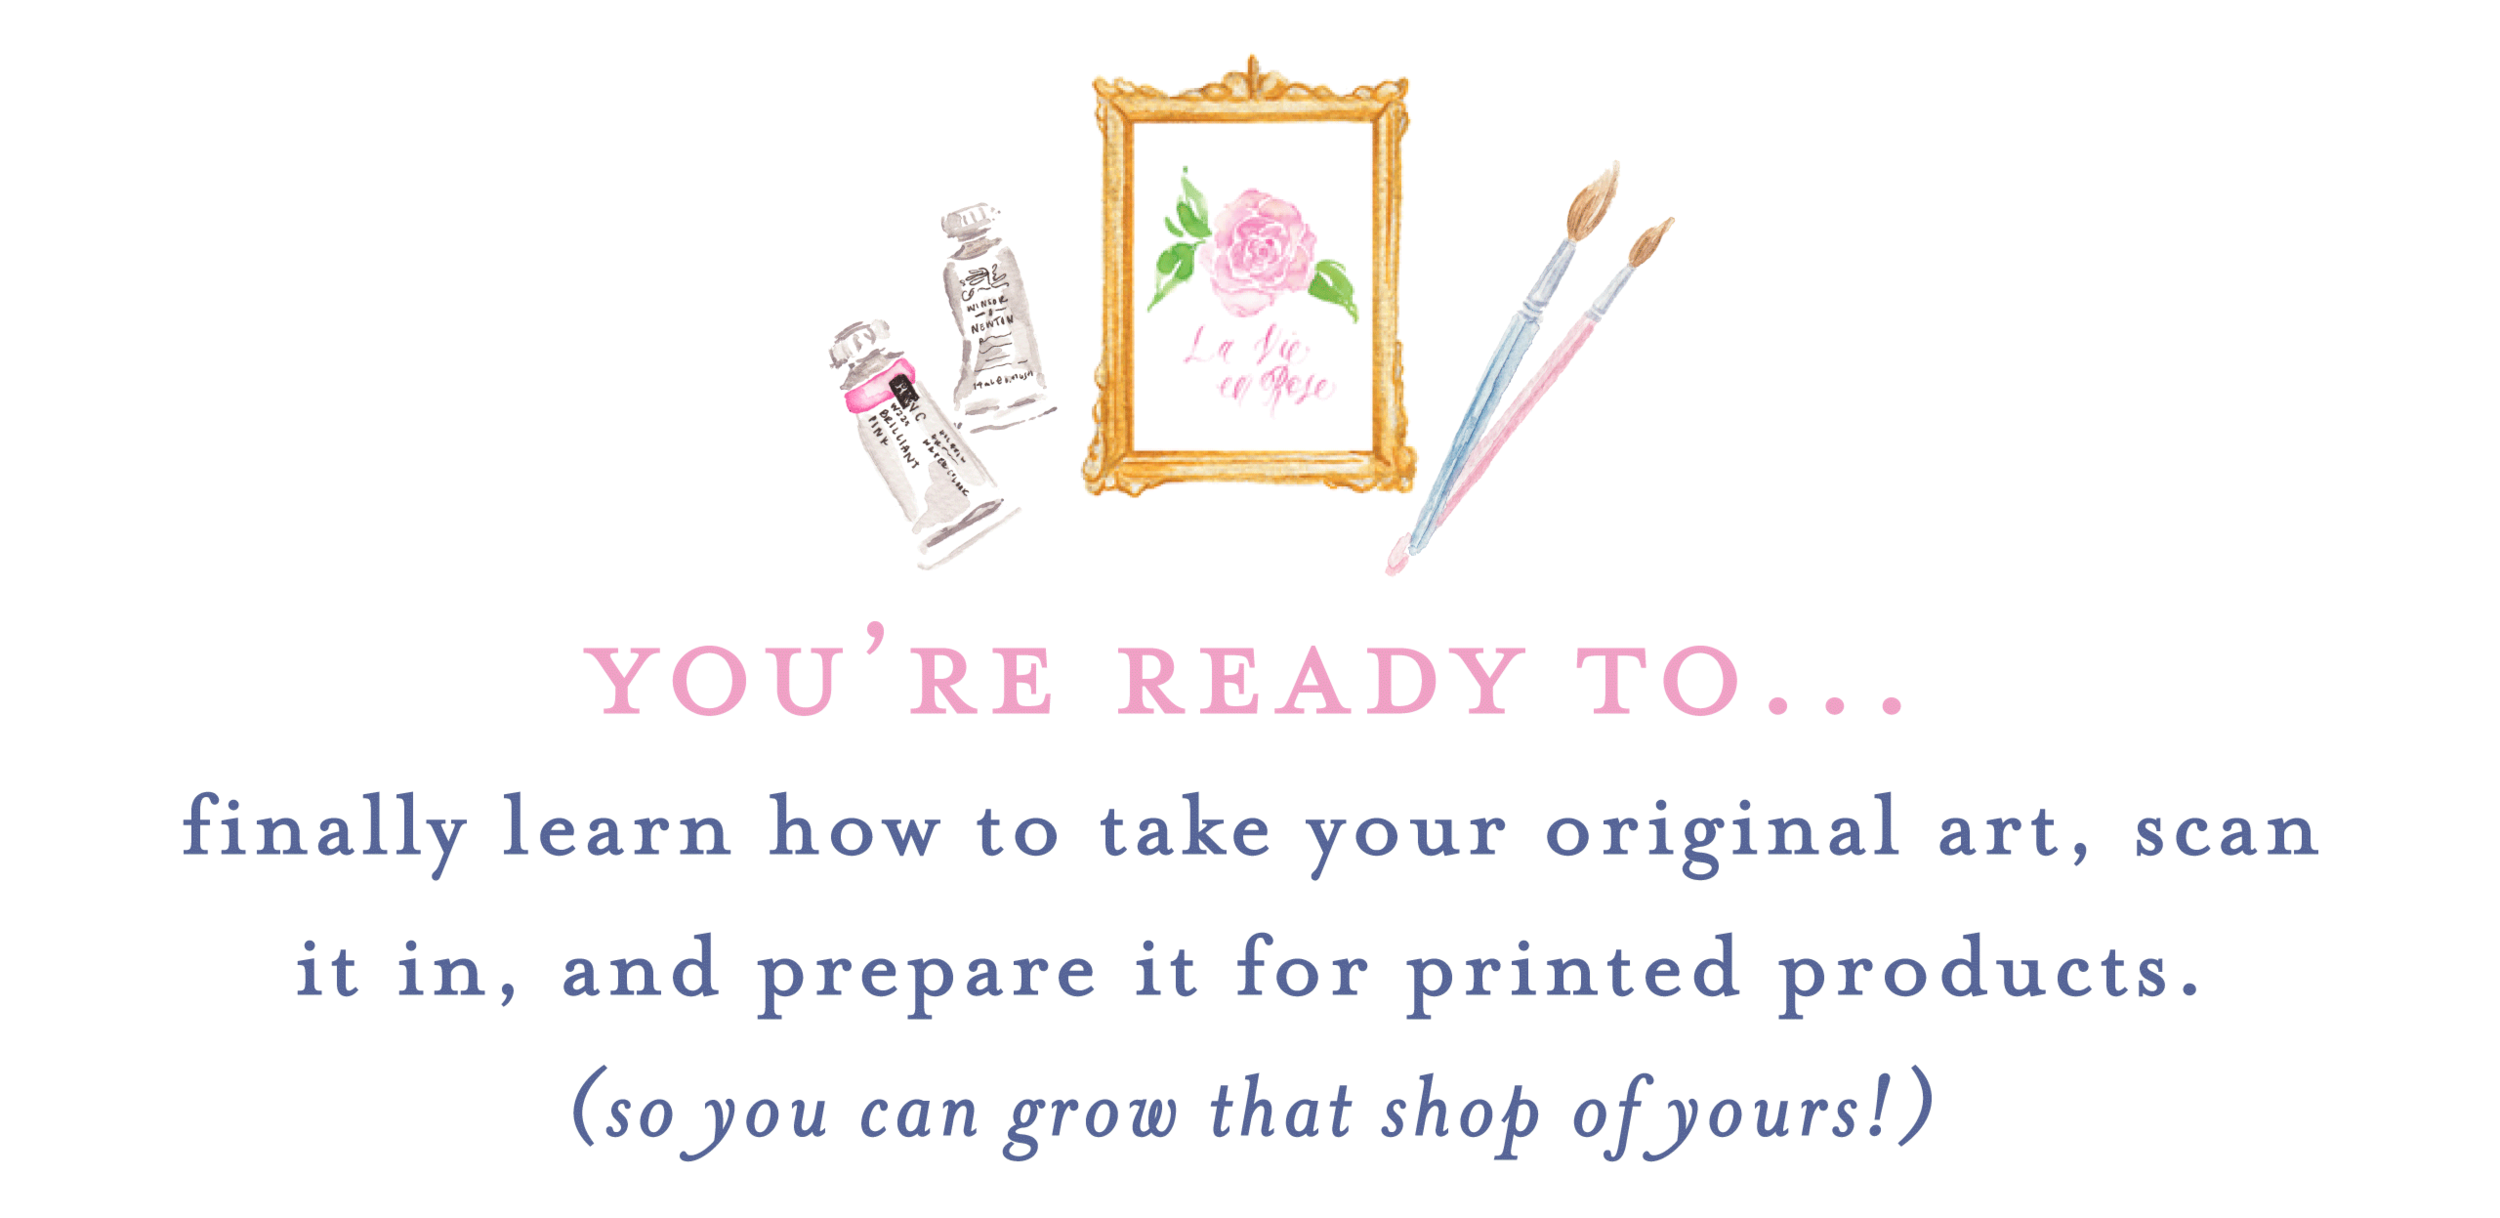 SJM-Art-School-You're-Ready-Digitizing-Watercolors.png